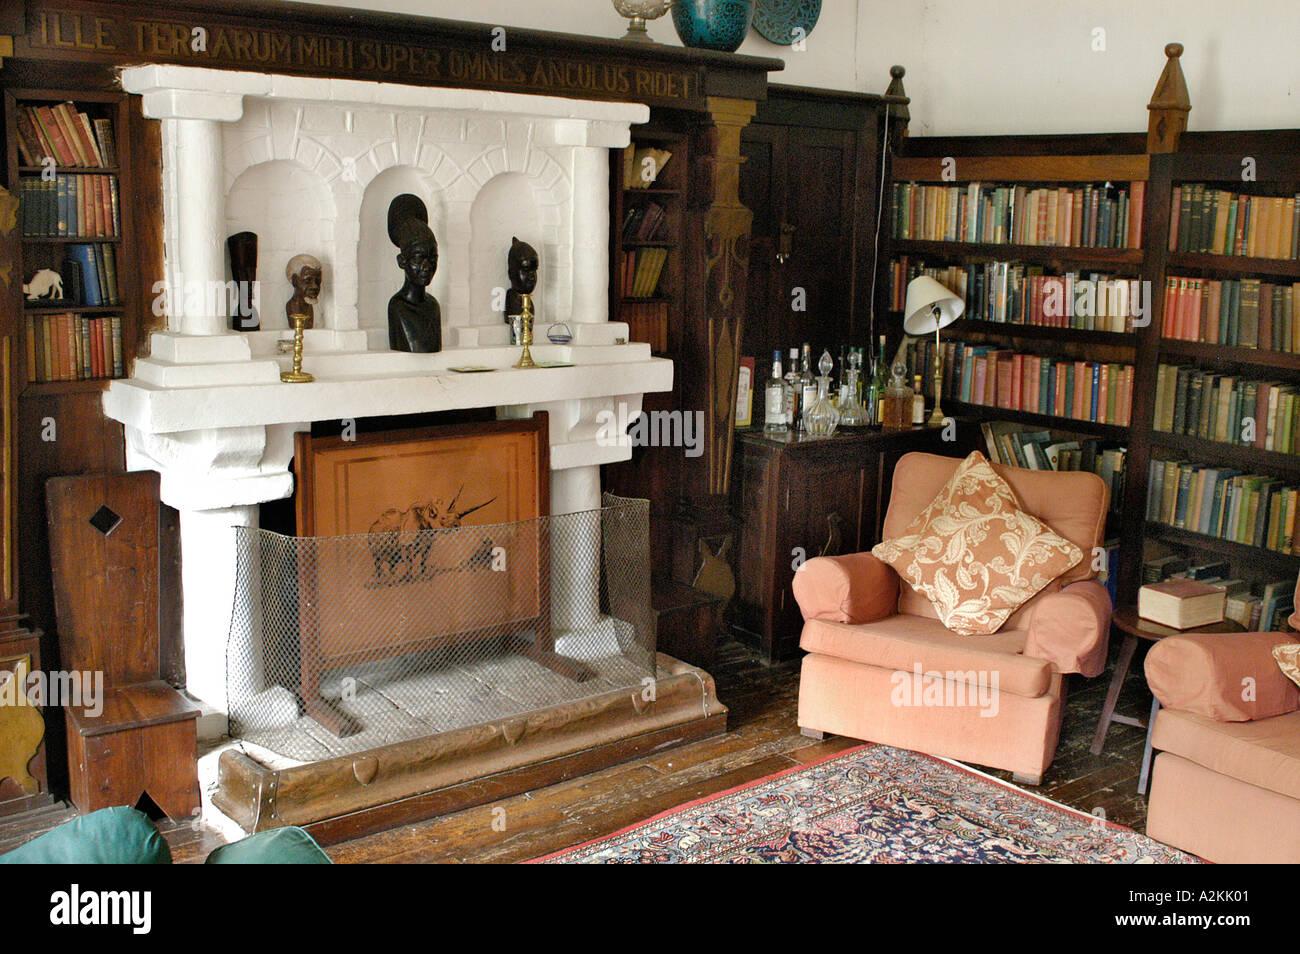 English Colonial Stockfotos & English Colonial Bilder - Alamy